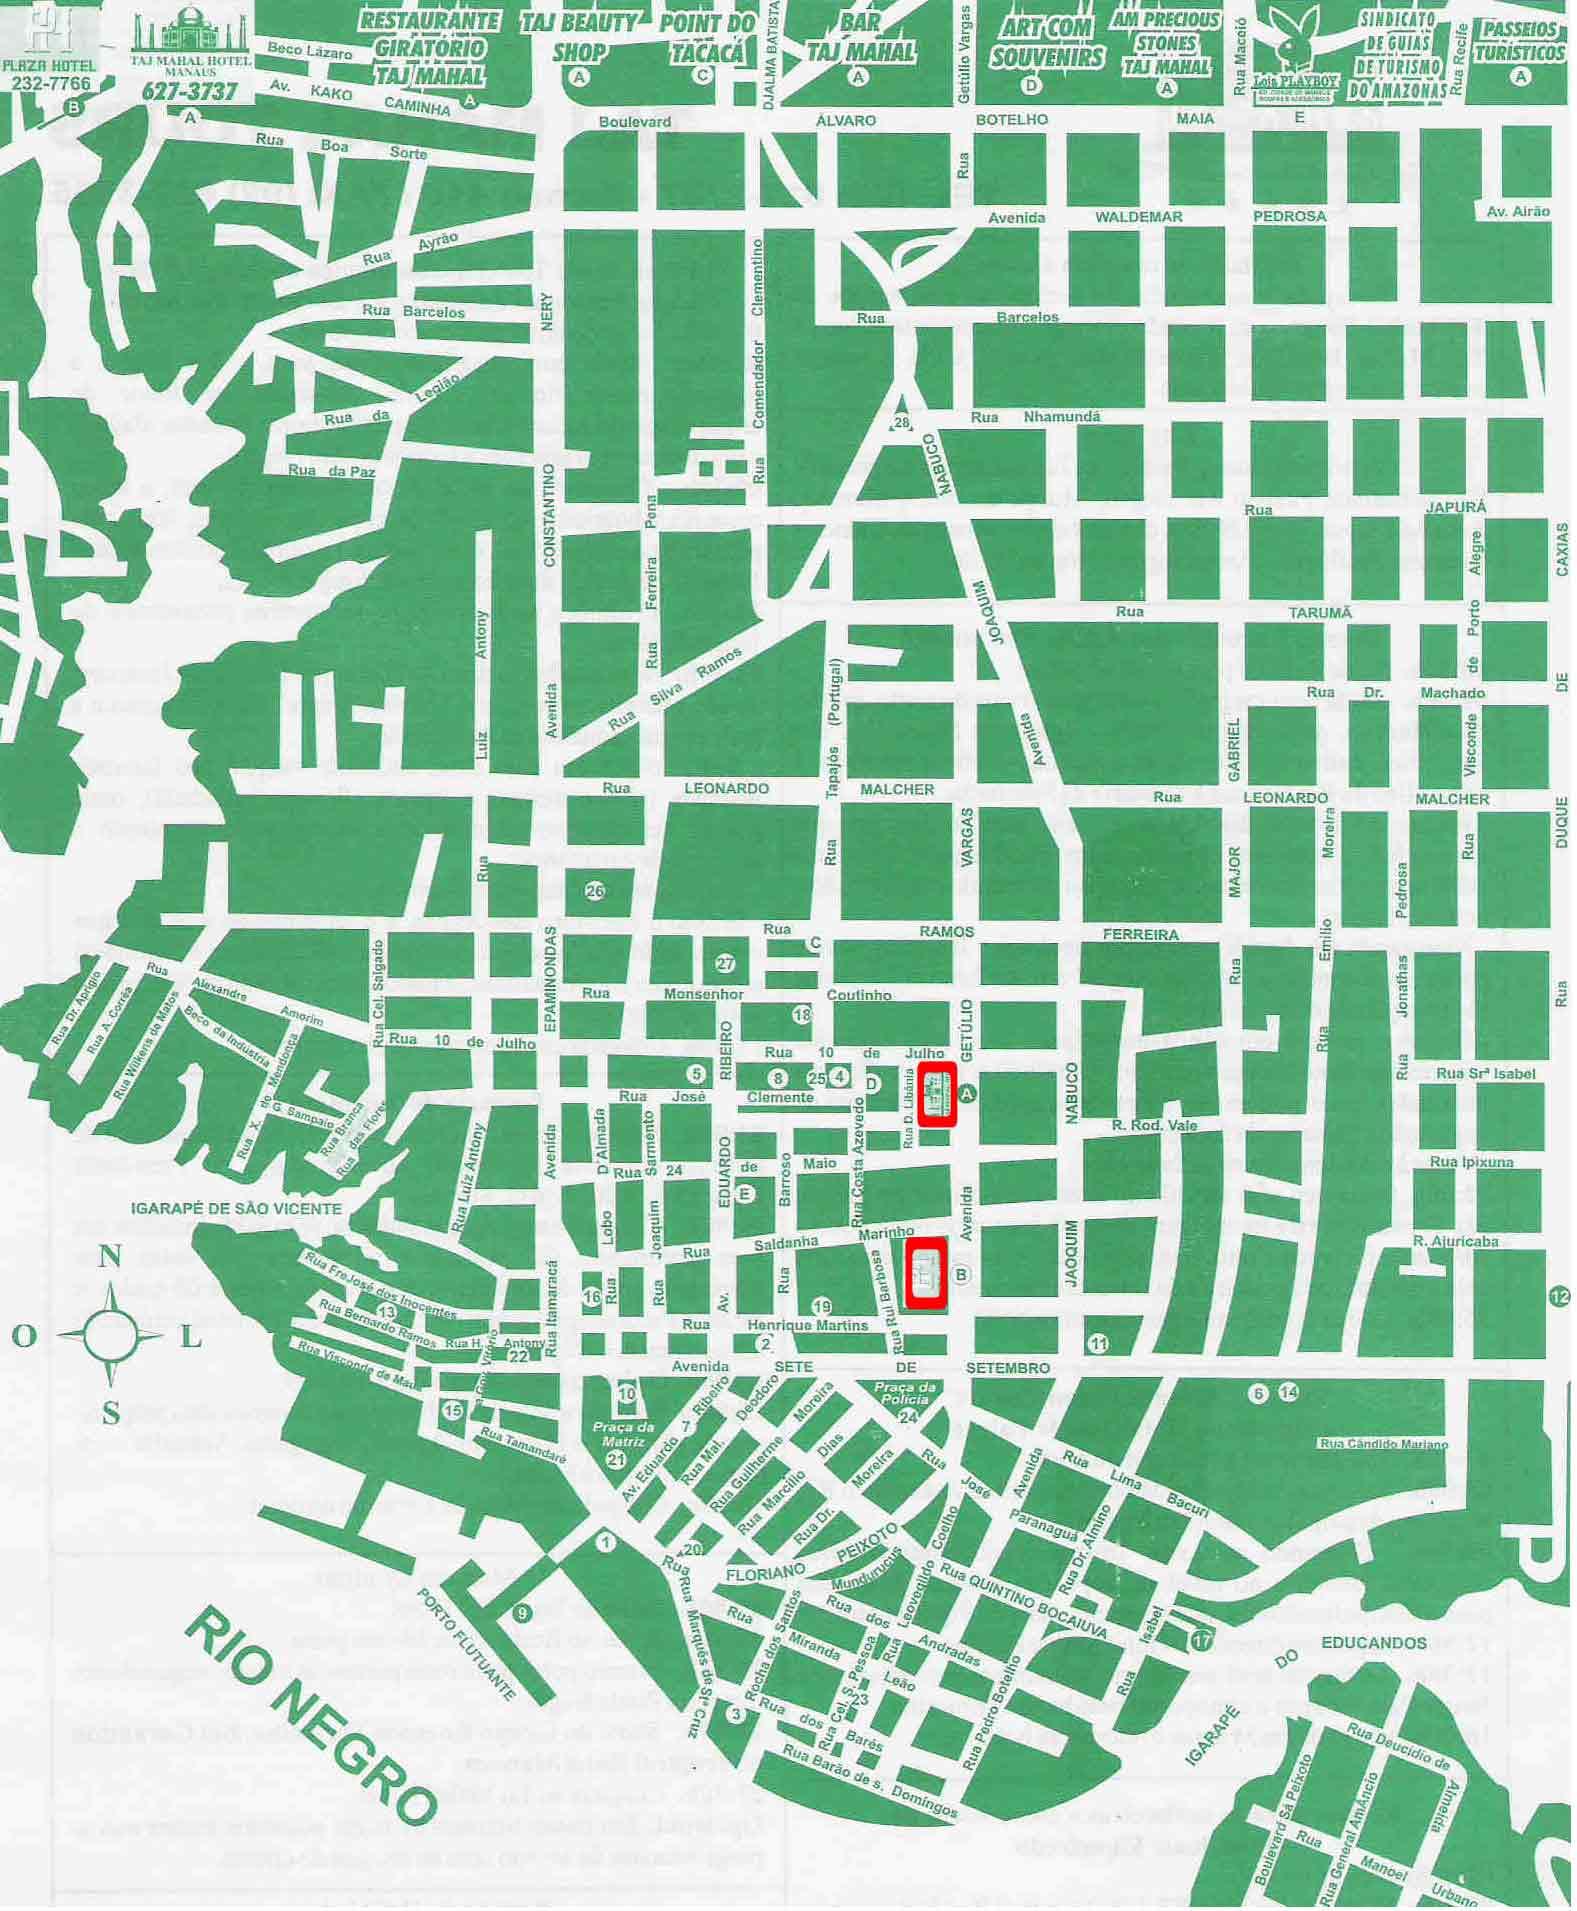 Manaus Center Map - Manaus Brazil • mappery